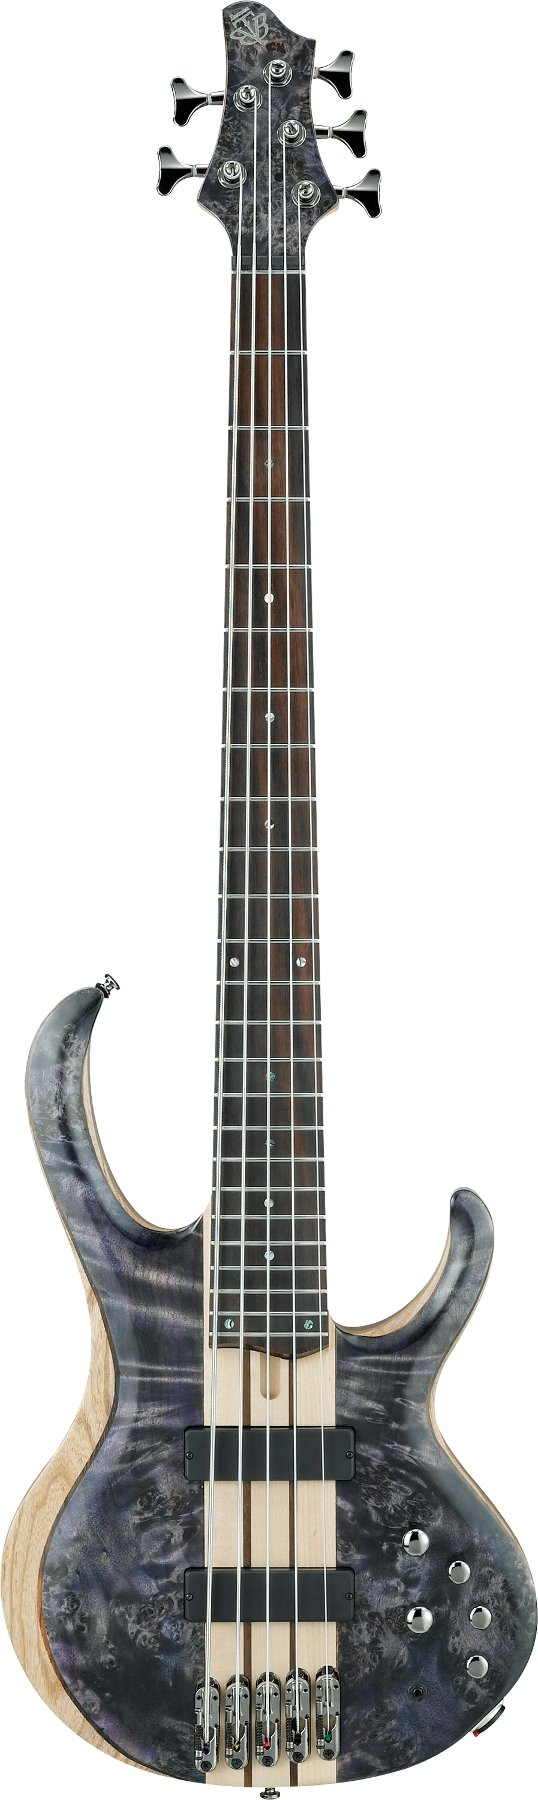 Ibanez BTB845 BTB Standard 5str Electric Bass - Deep Twilight Low Gloss BTB845DTL